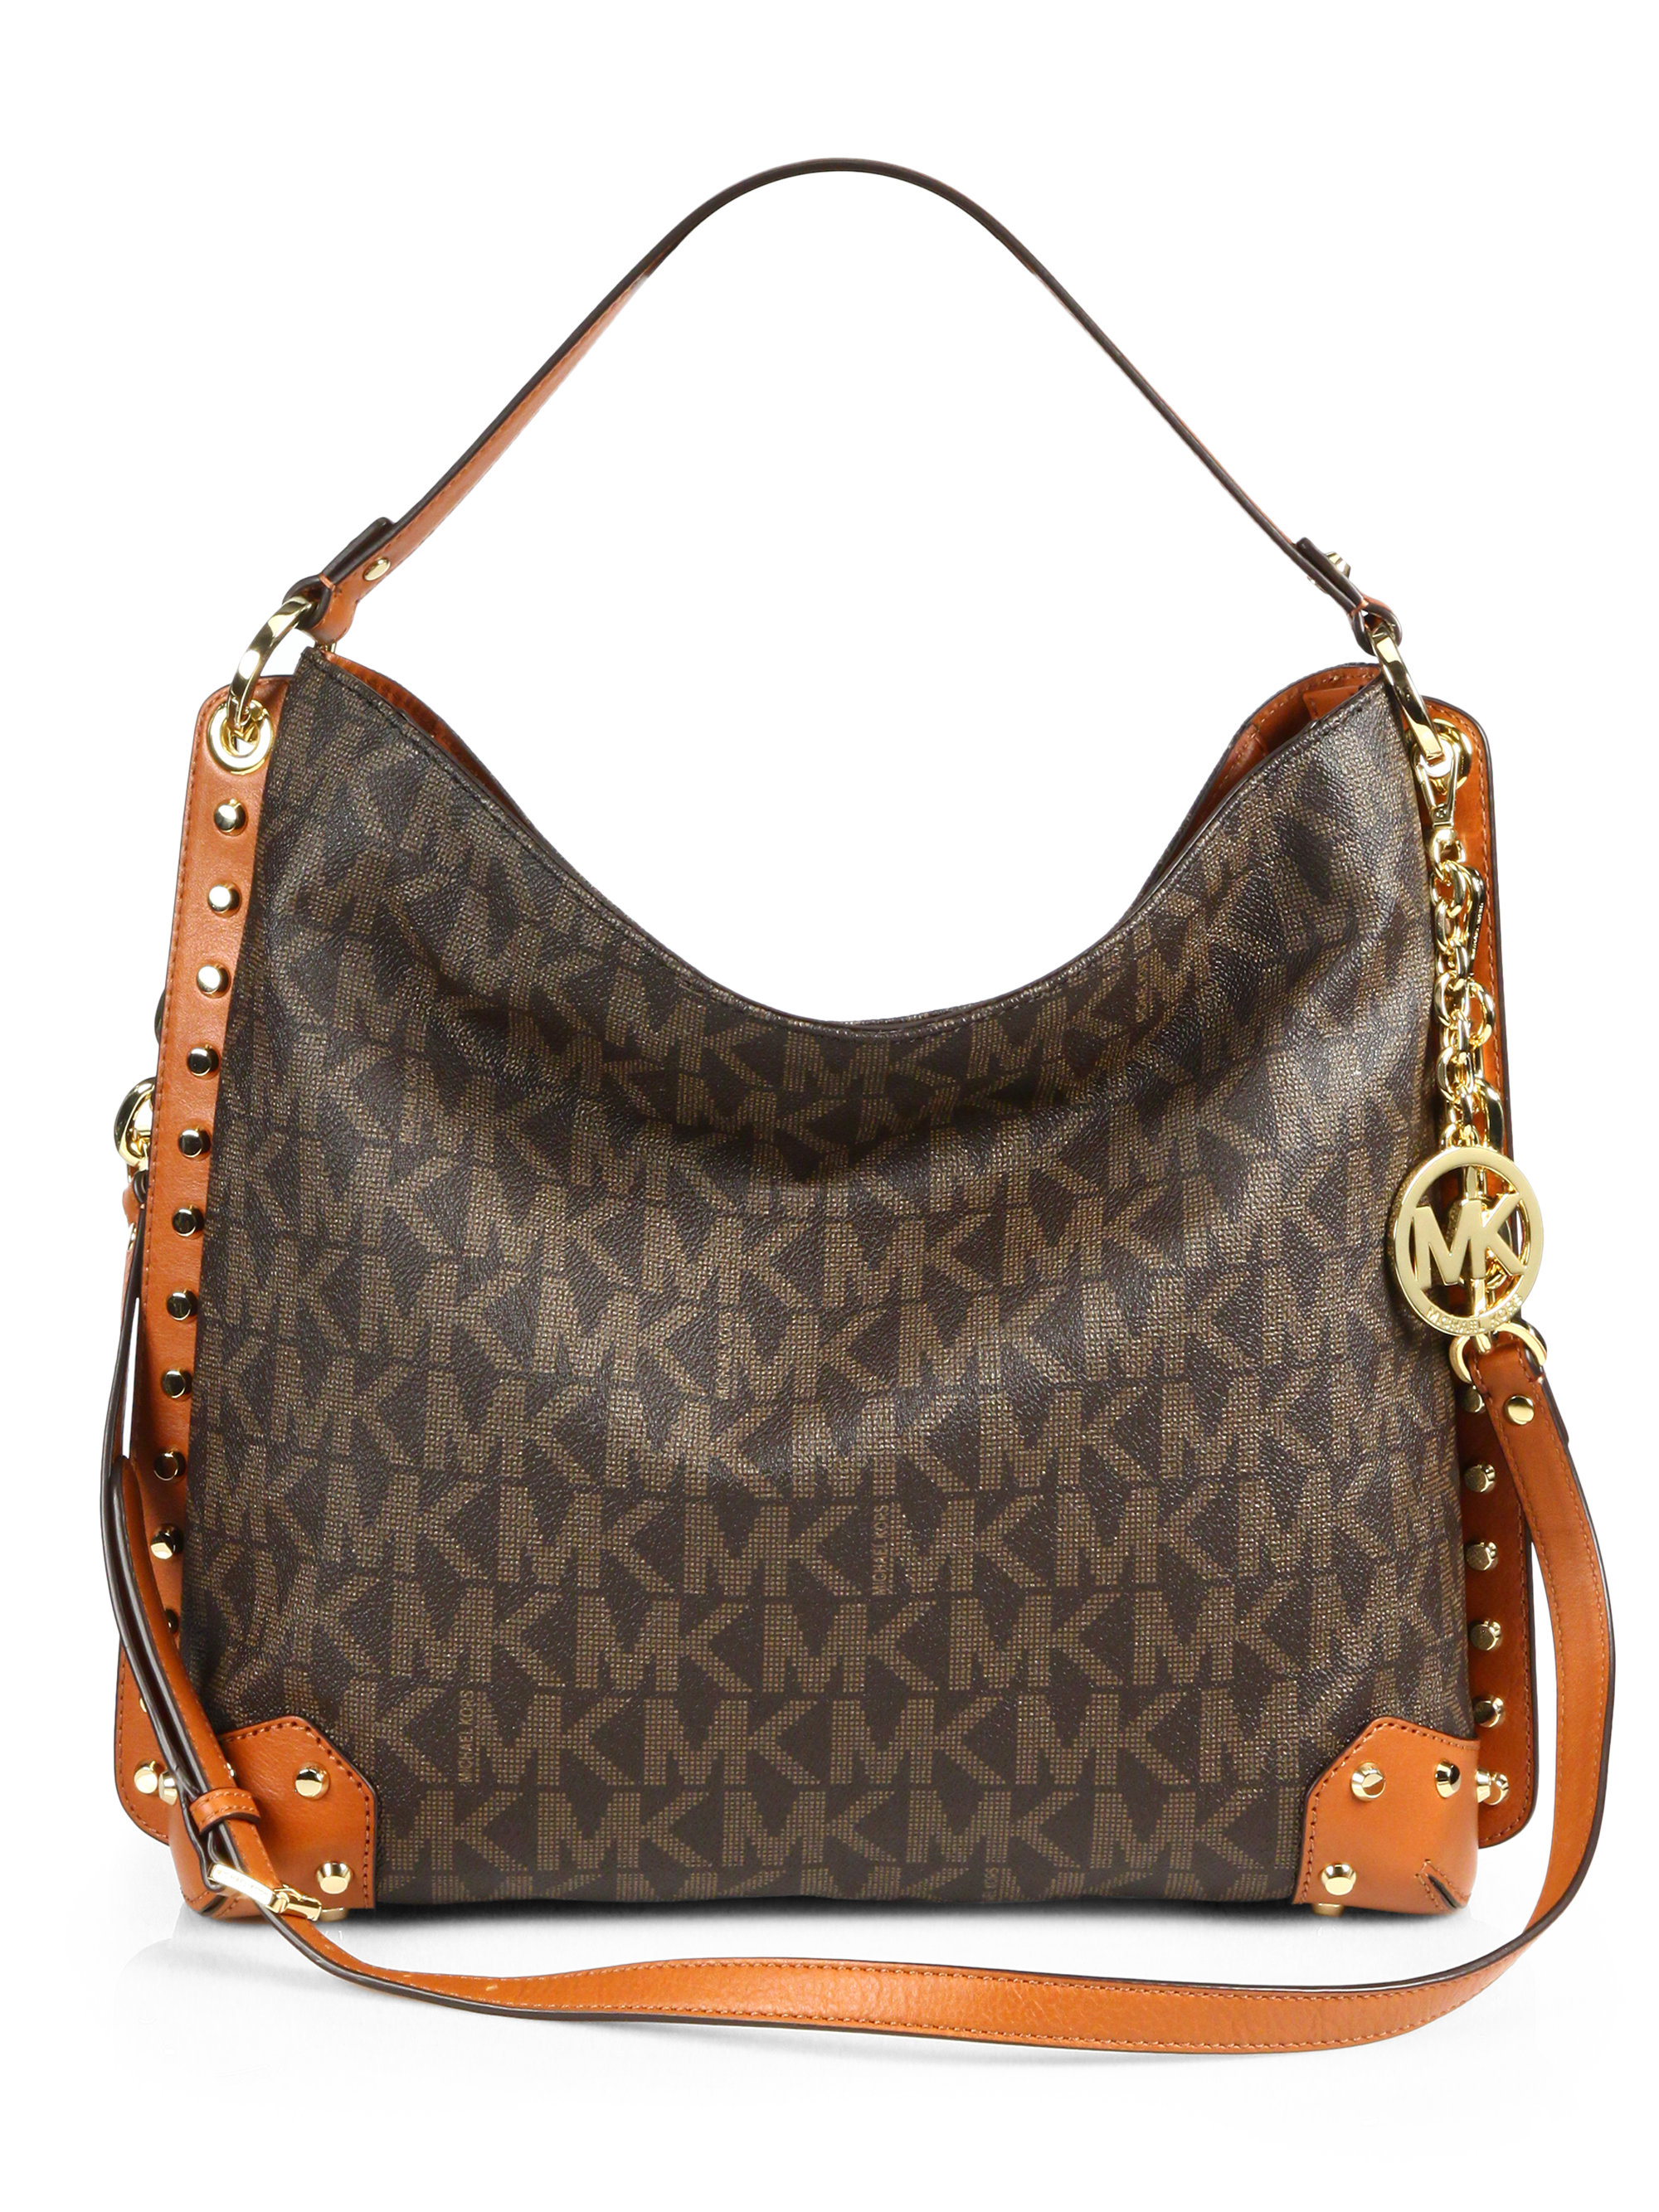 Lyst - Michael Michael Kors Serena Large Shoulder Bag in Brown